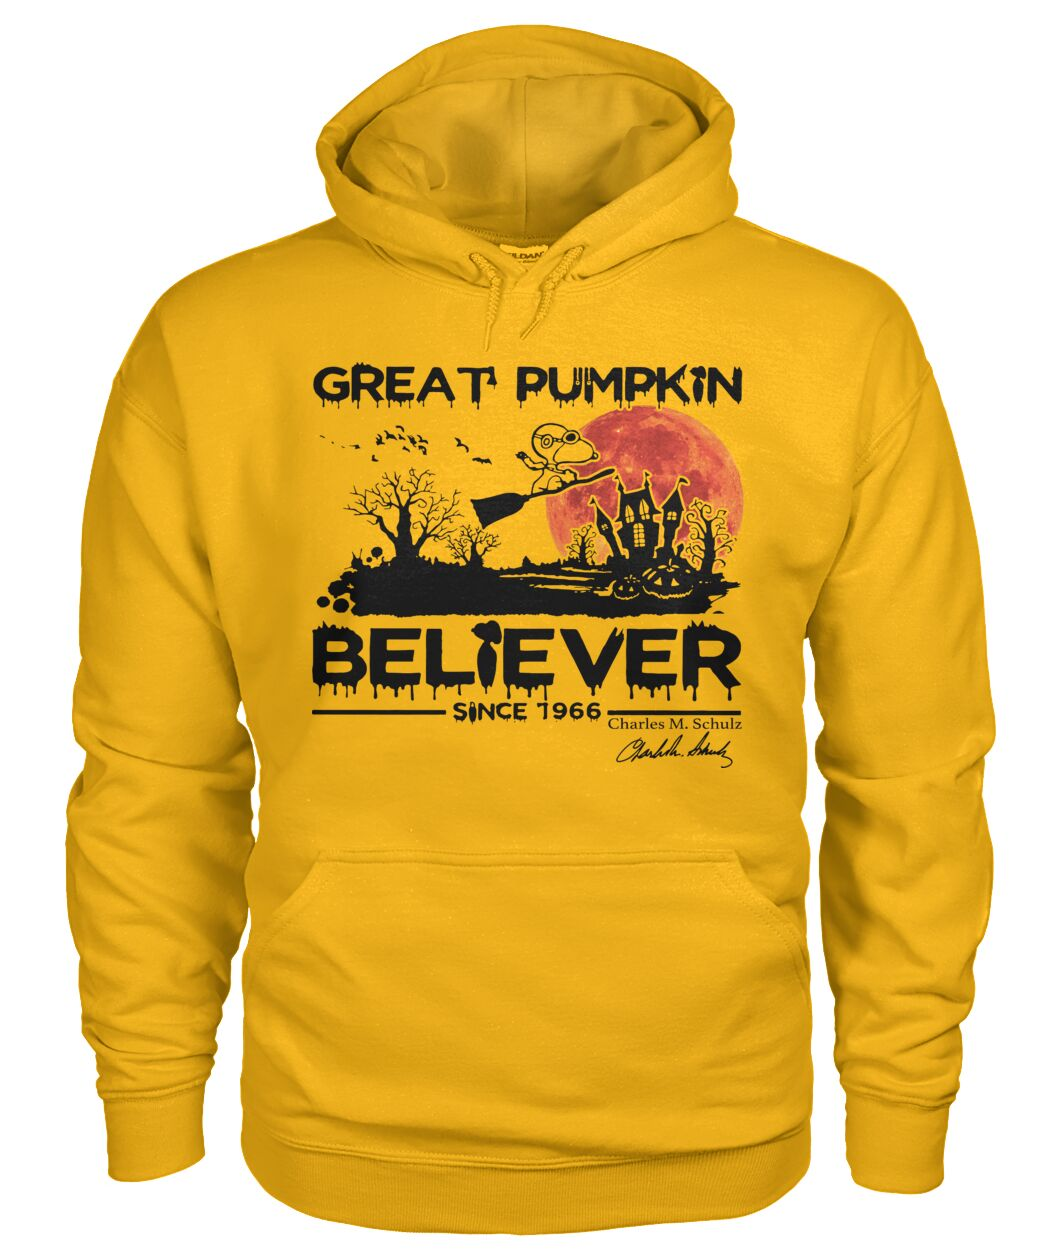 Great Pumpkin Believer 1996s Fans Hoodie